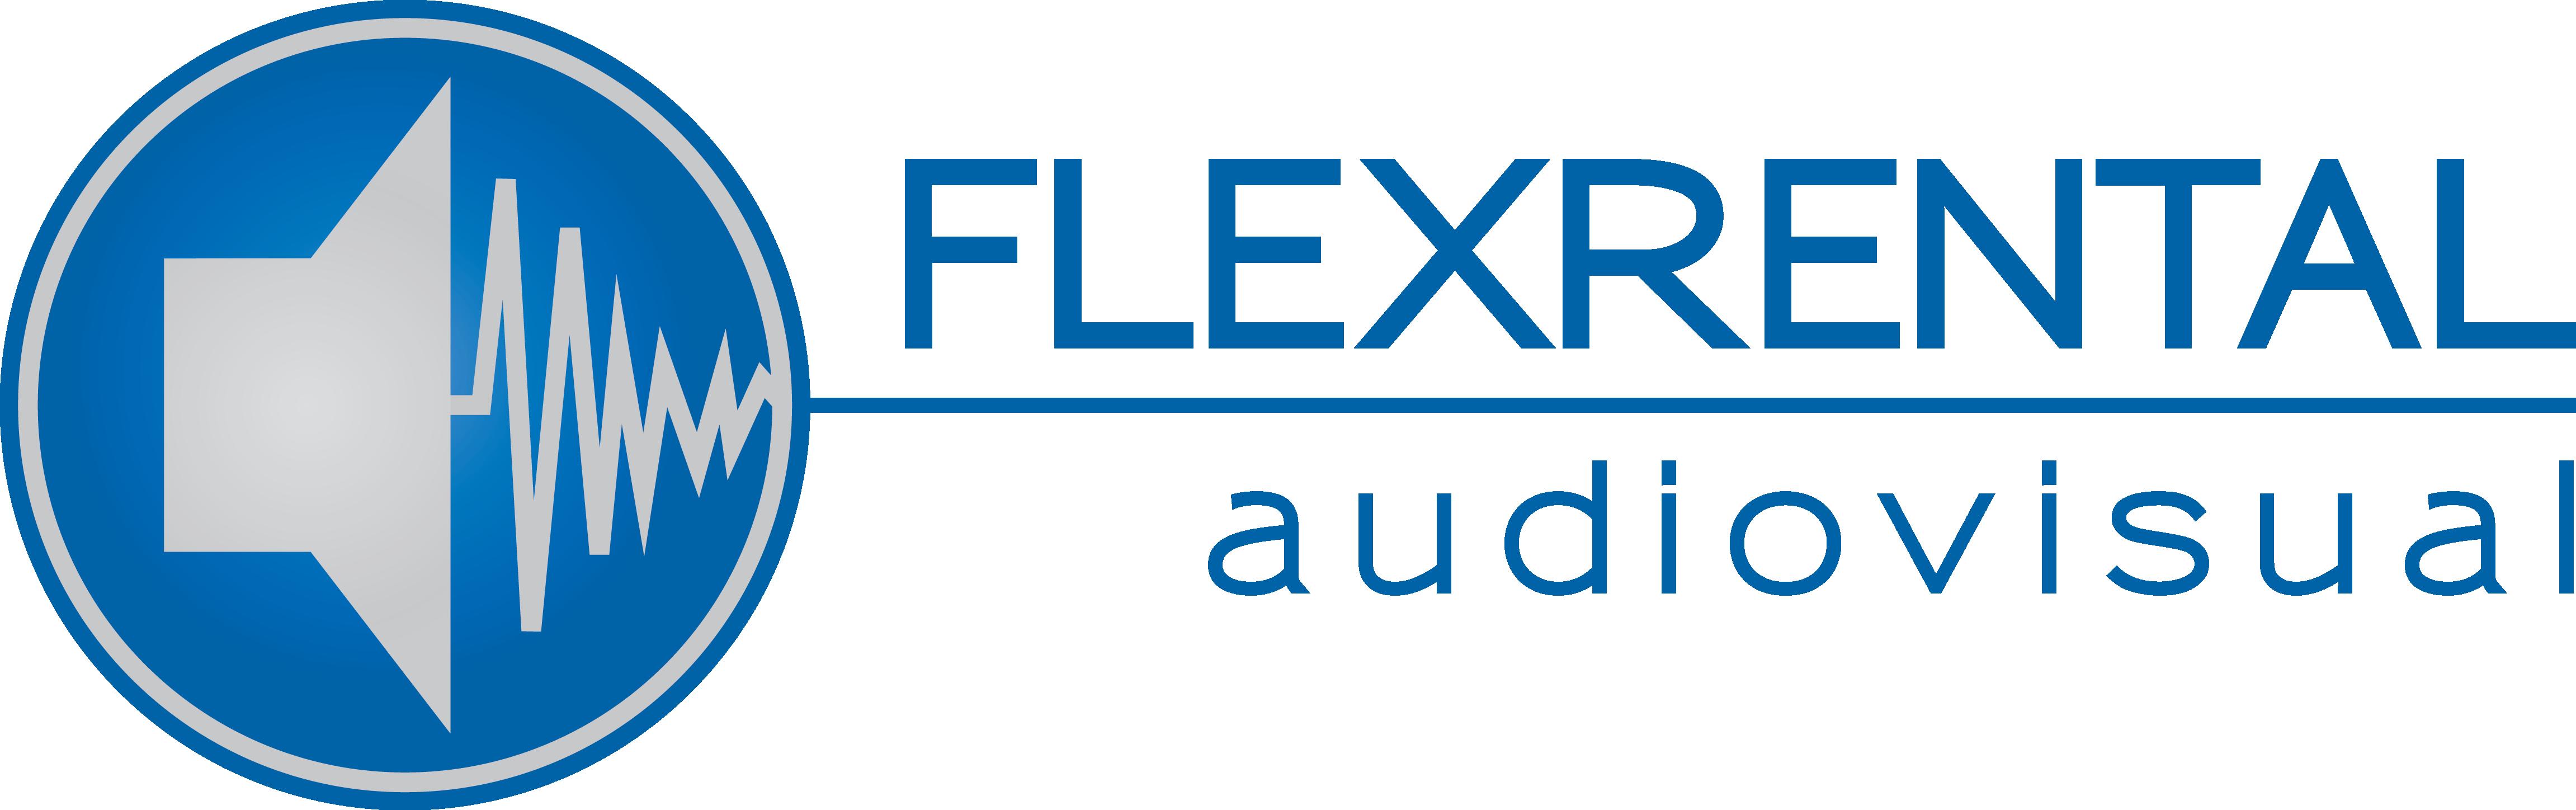 Flexrental